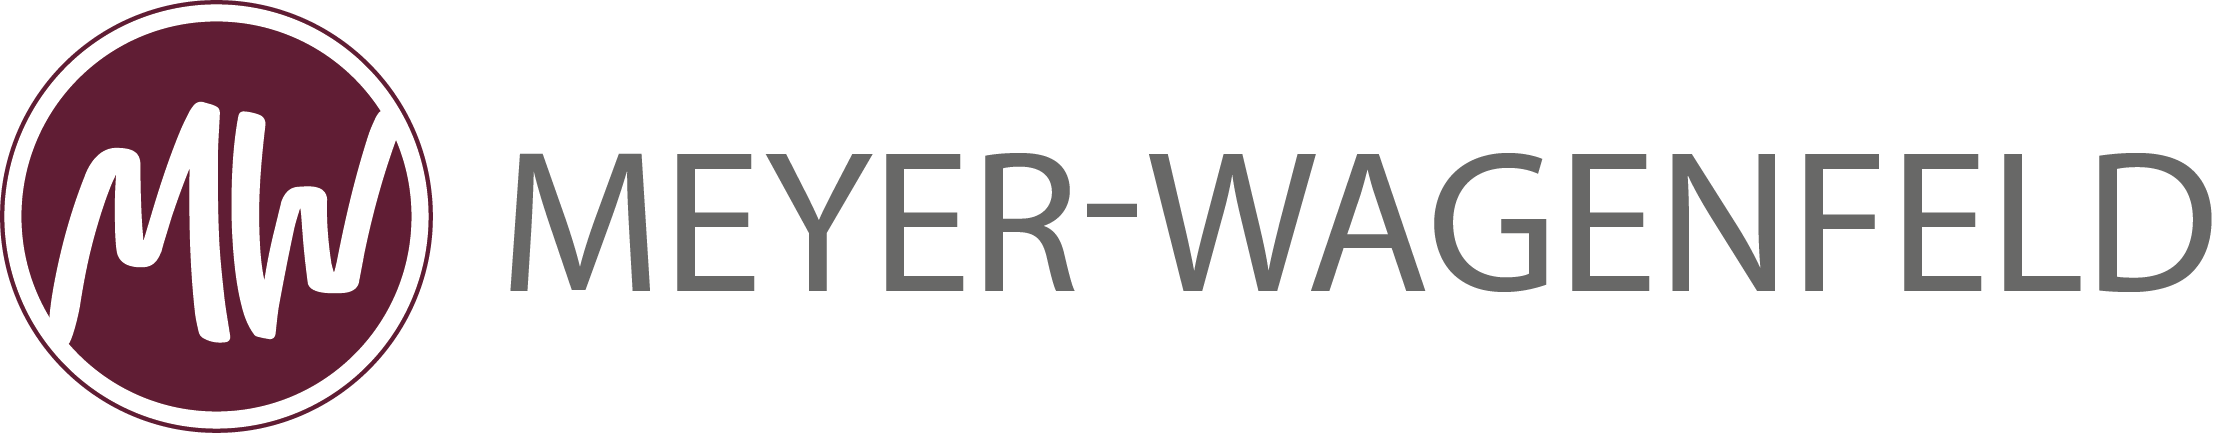 Meyer Wagenfeld Logo